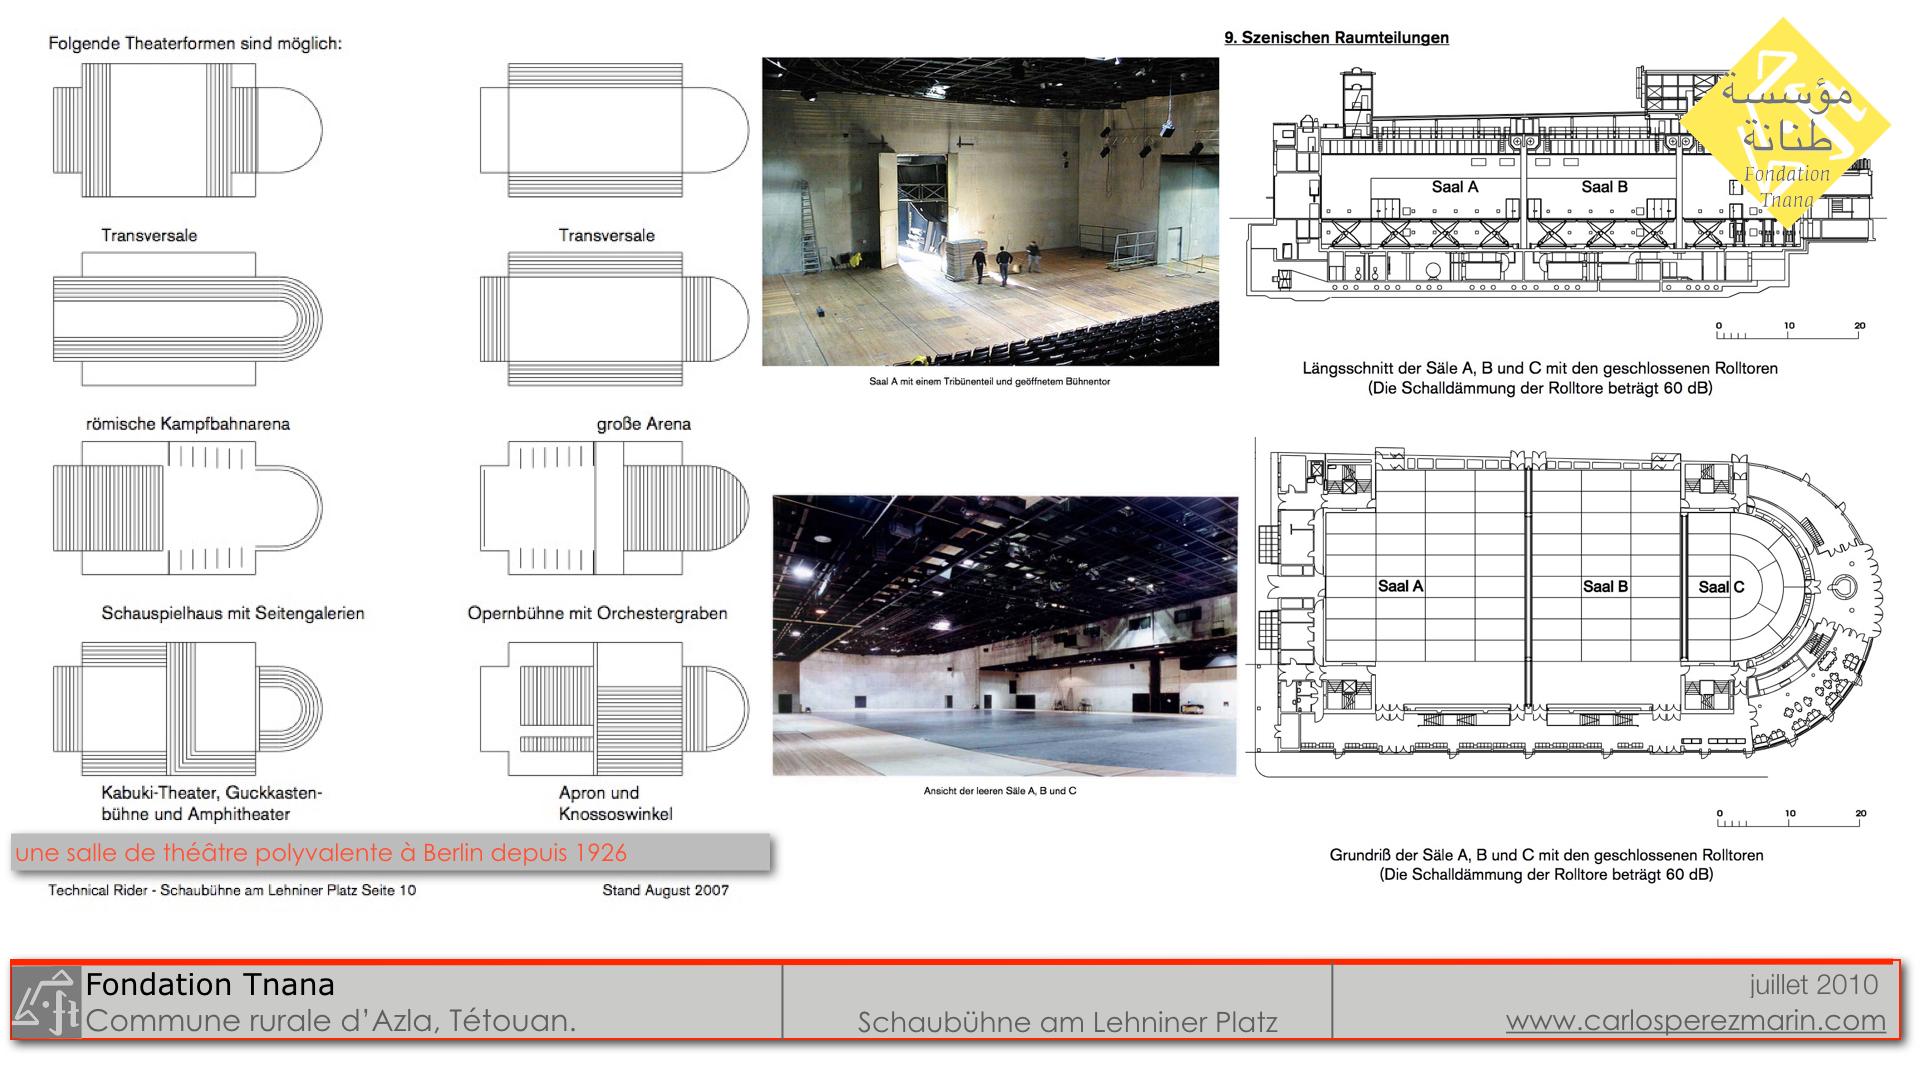 FONDATION TNANA DOSSIER PDF 10.08.17.033.jpeg